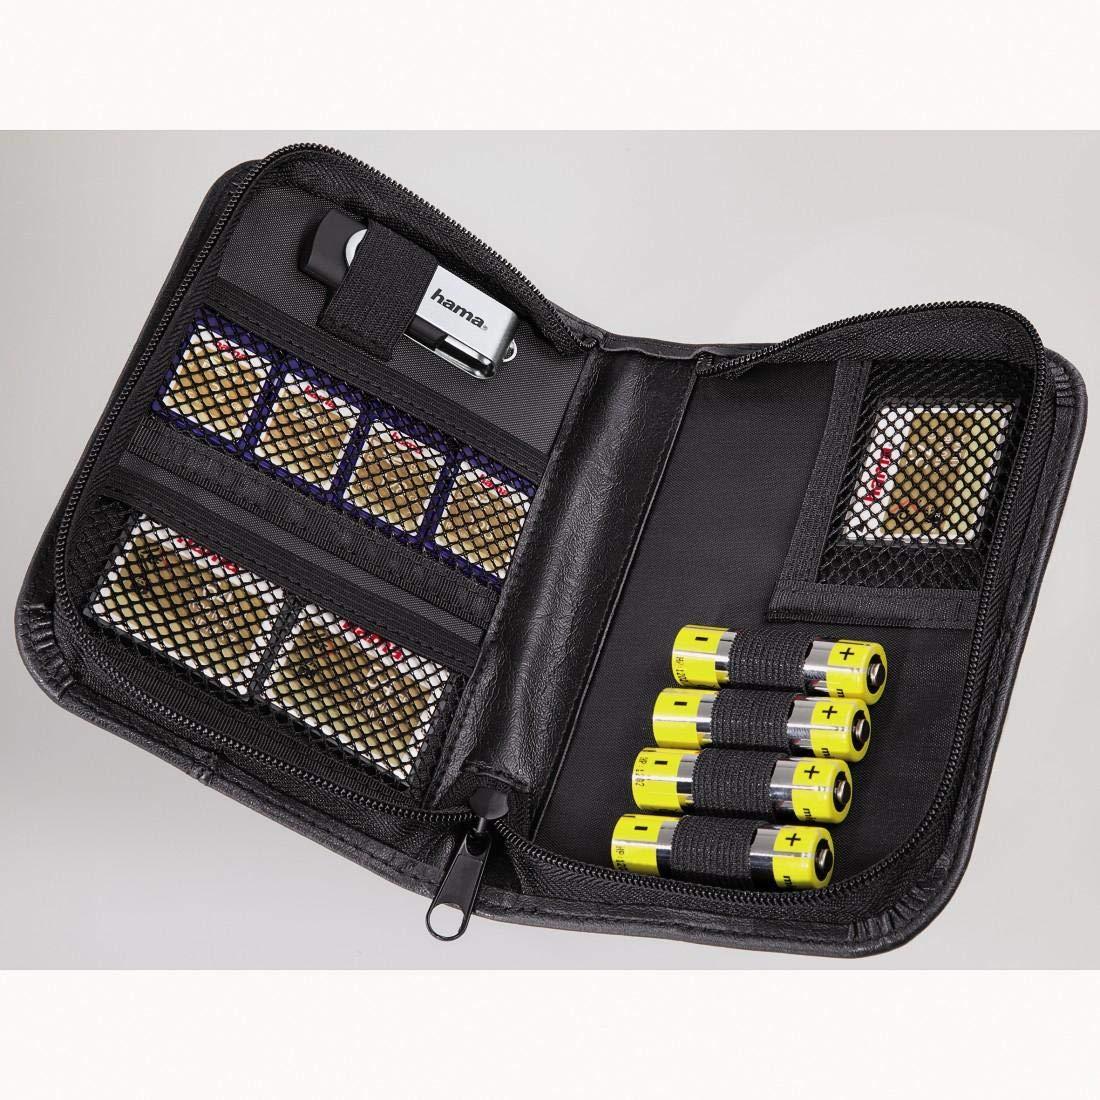 Hama Custodia per Memory card universale, nero 4007249471536 CF MMC MemoryStick(TM) PCcards SD SM XD compactflash memorycard